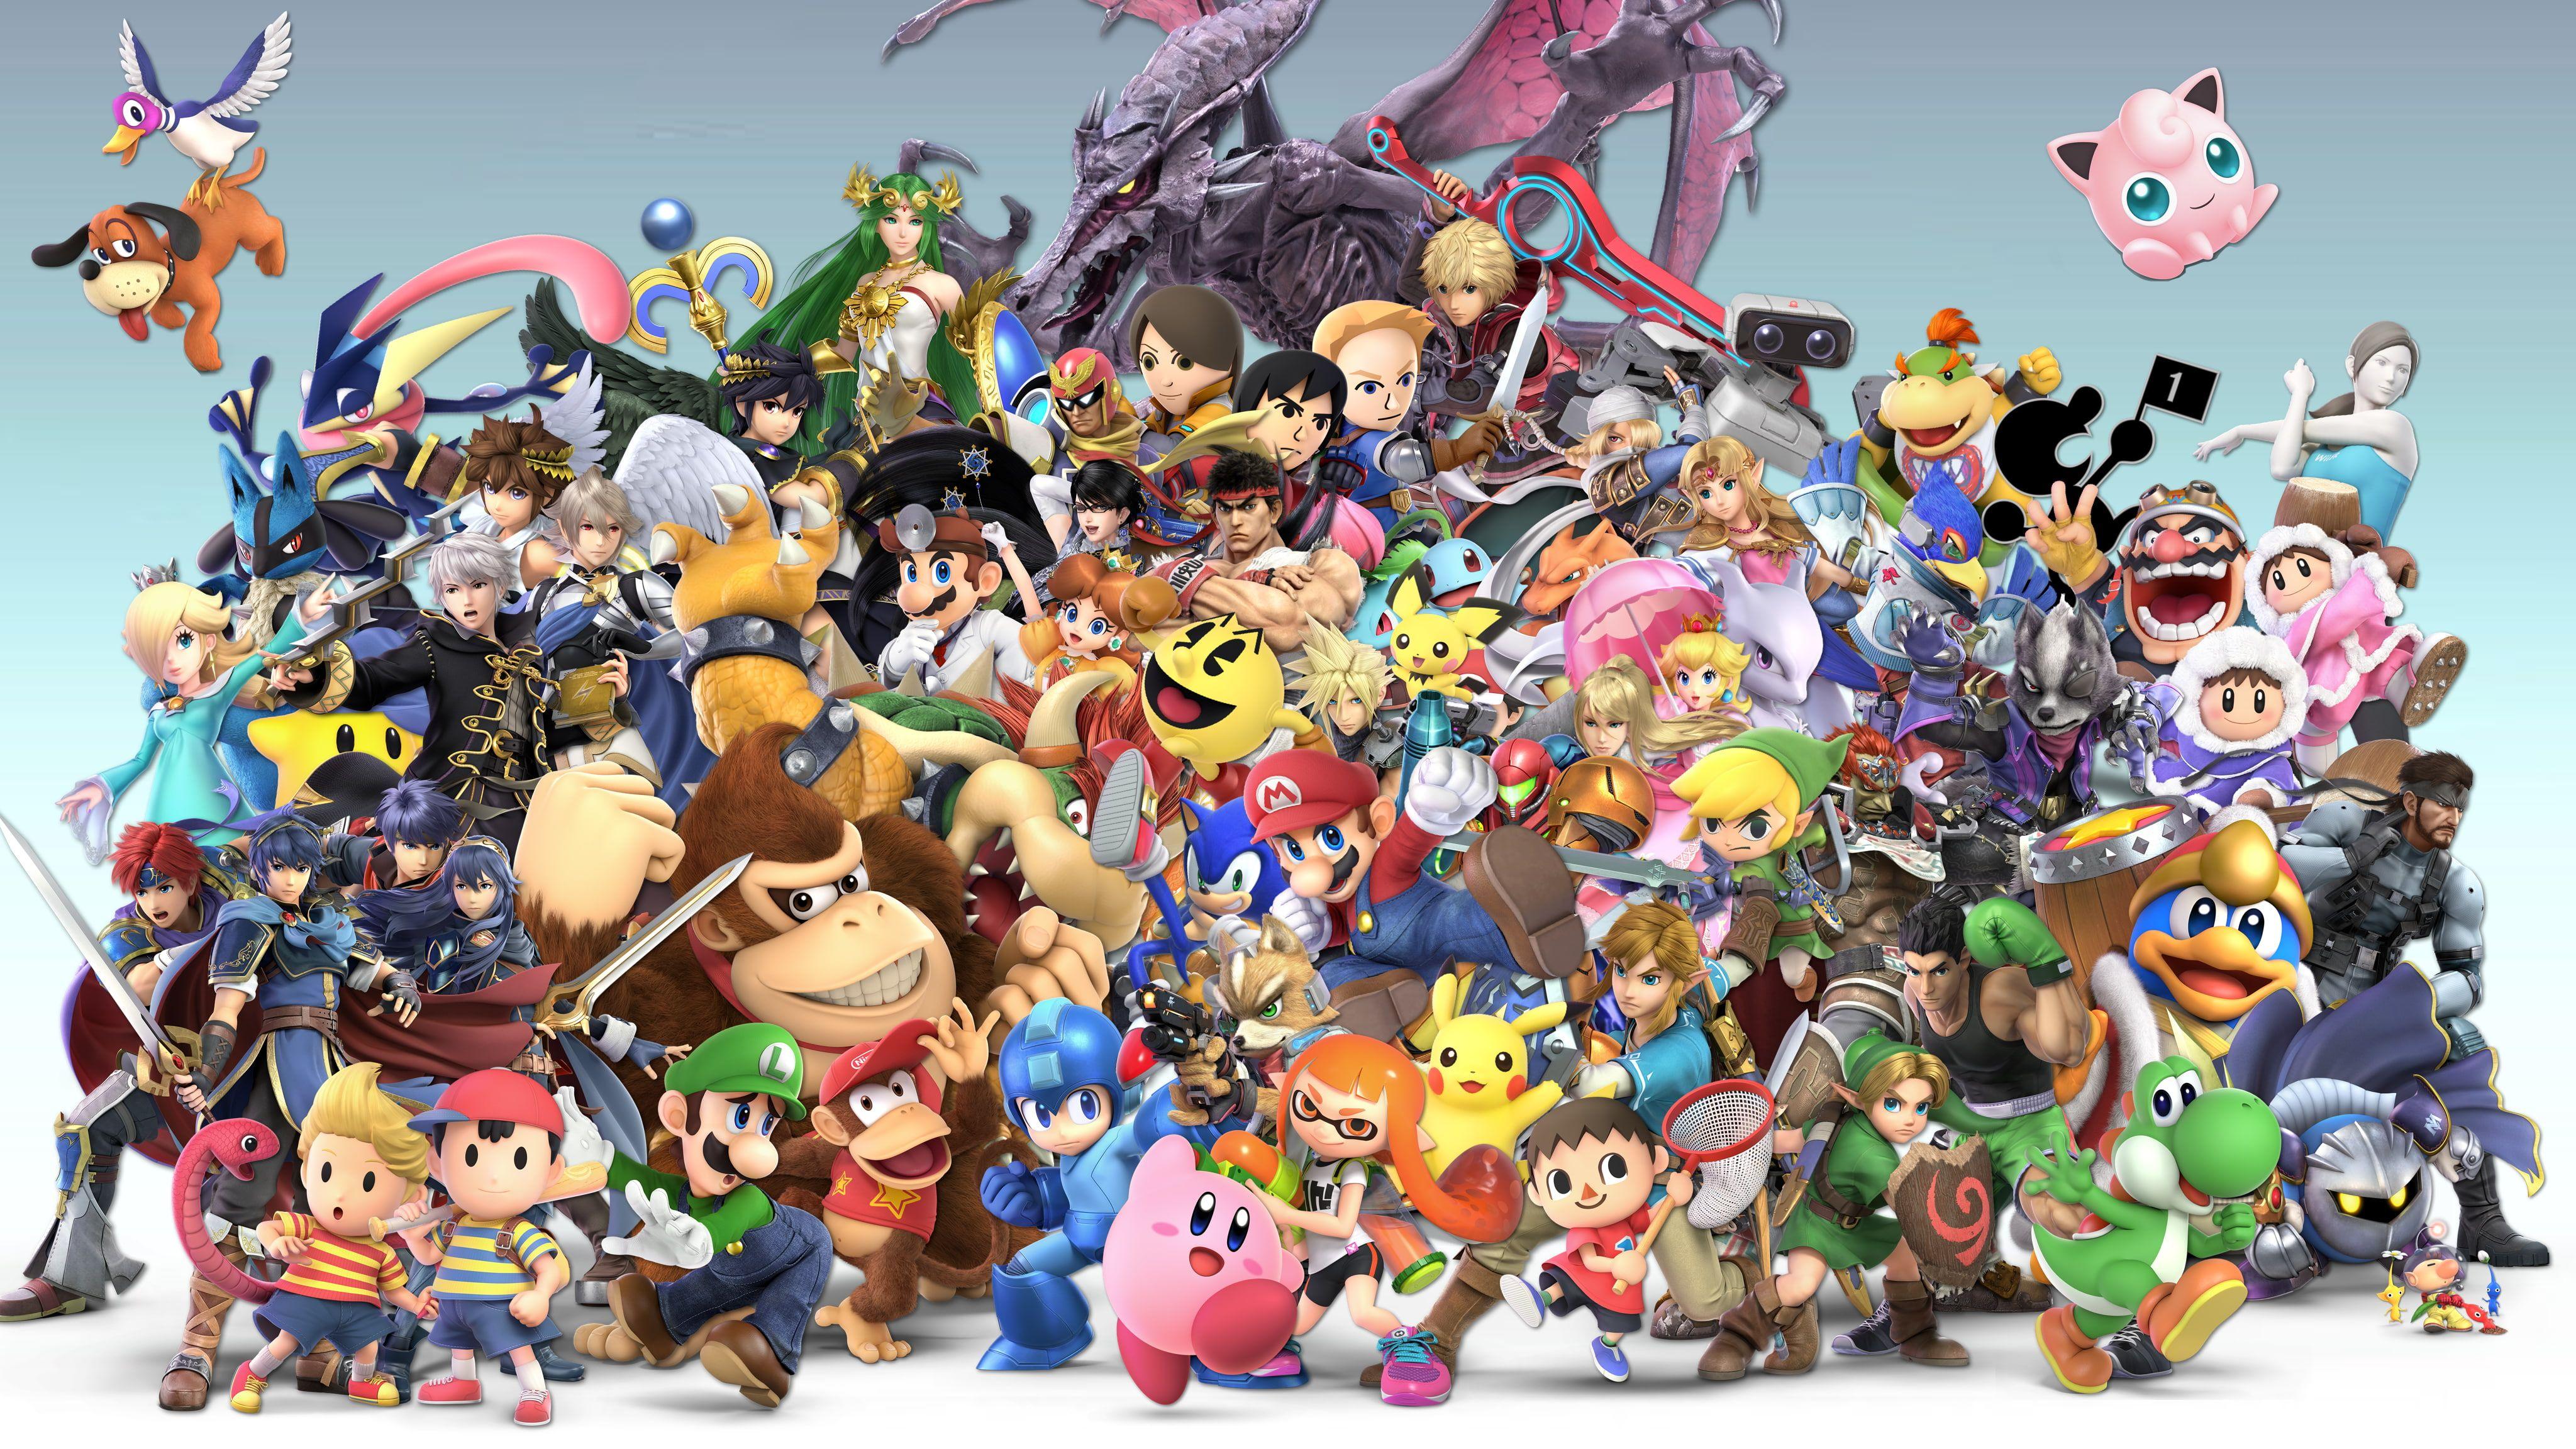 Video Game Super Smash Bros Ultimate Bowser Bowser Jr Captain Falcon Captain Olimar Charizard Pokemon Cl Dark Pit Kid Icarus Pokemon Jigglypuff Smash Bros